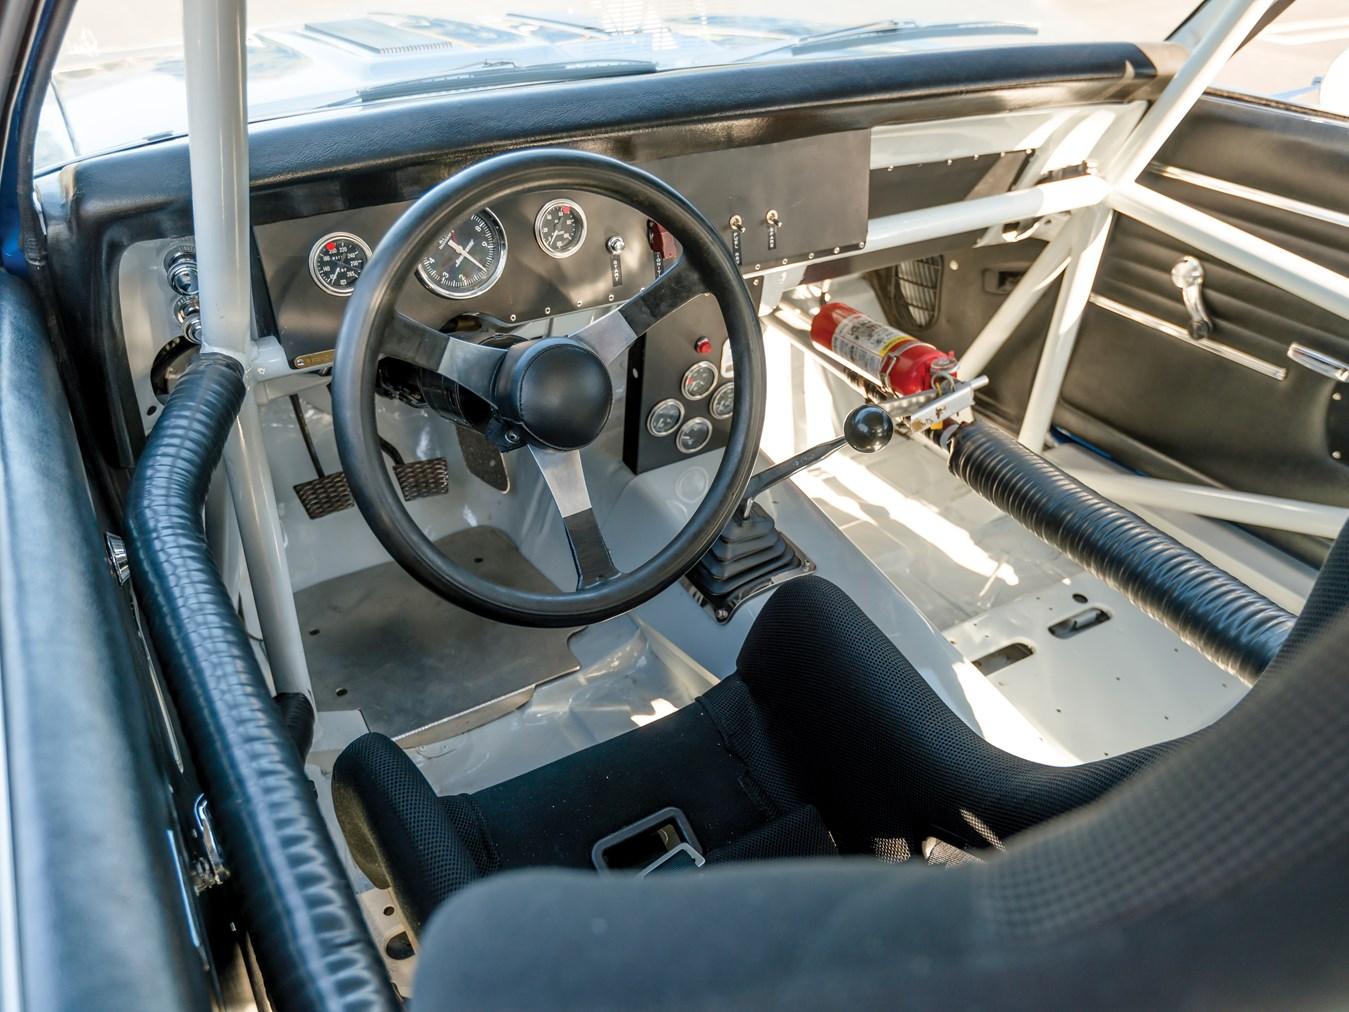 1968 Chevrolet Sunoco Camaro Trans Am